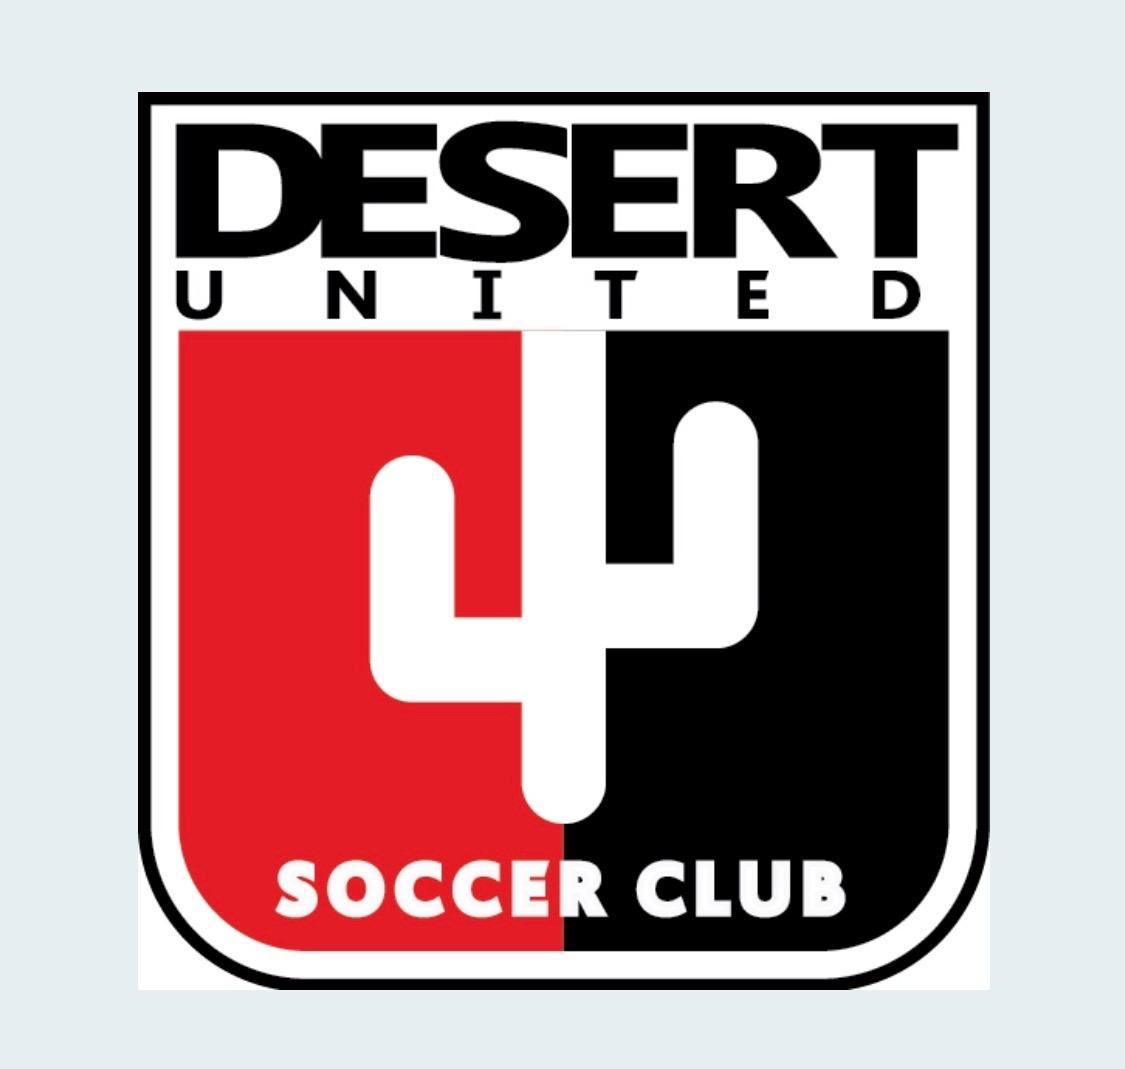 DESERT UNITED COACHELLA